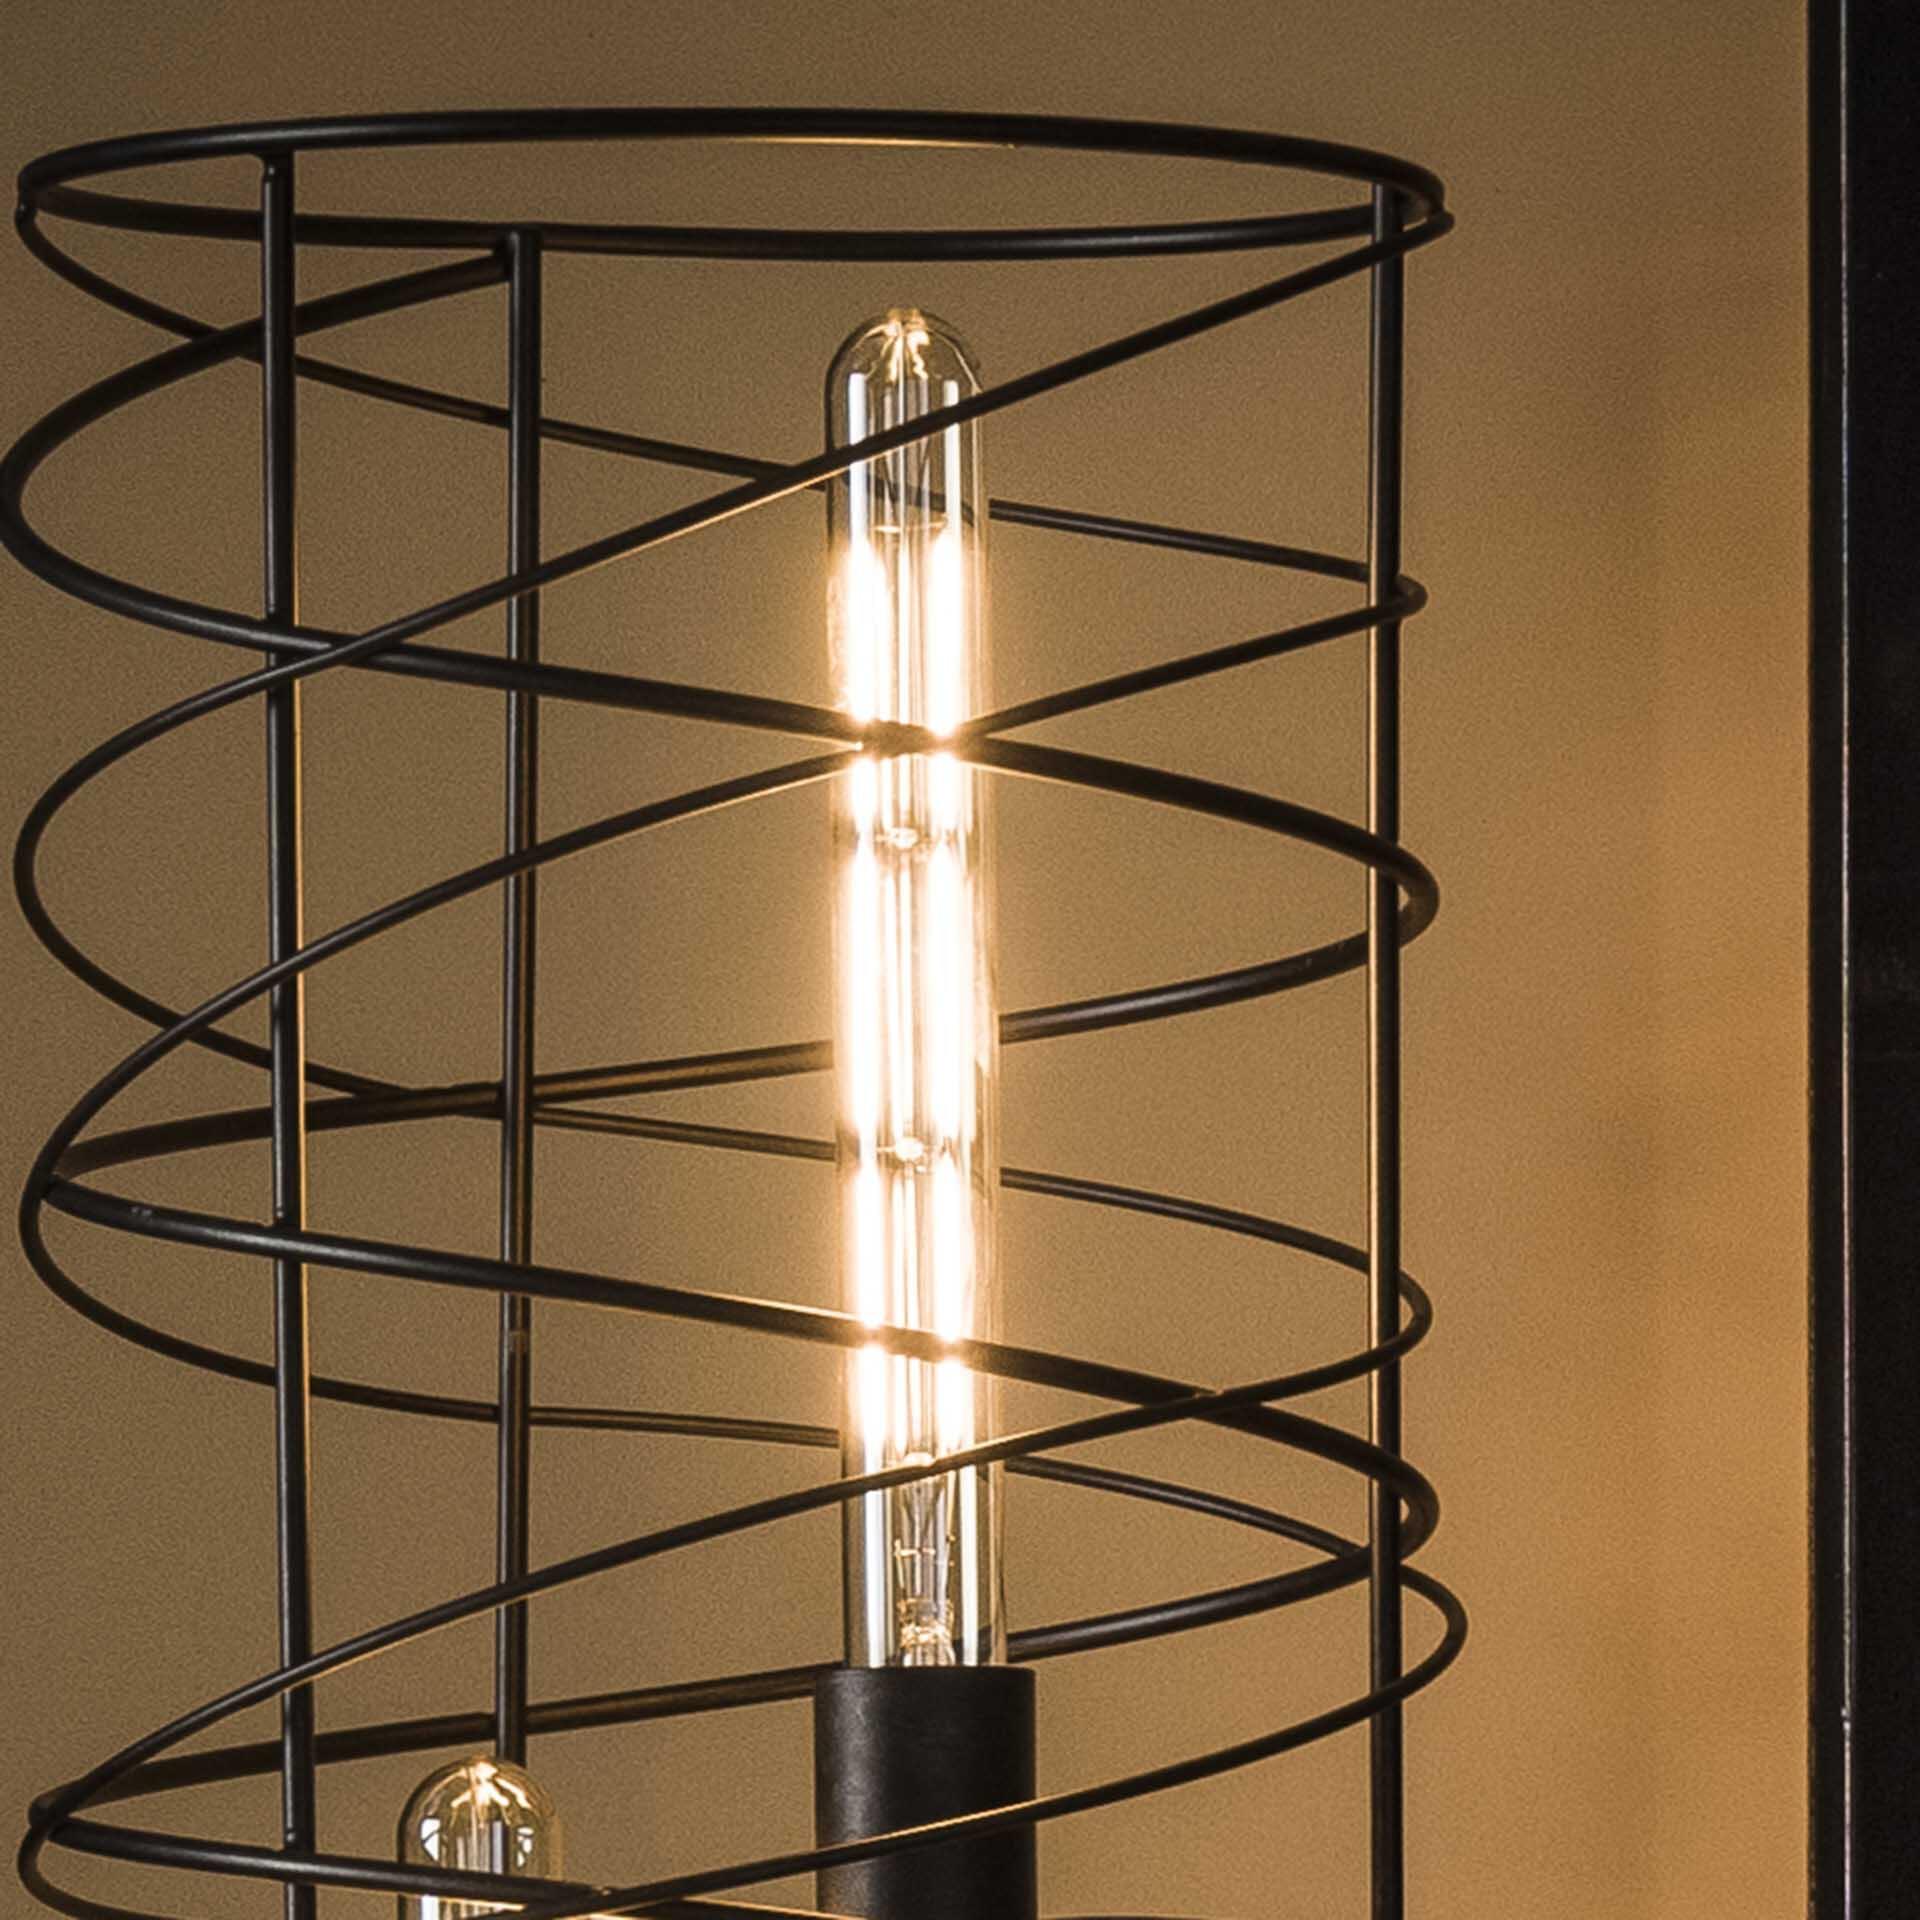 Kooldraadlamp 'Buis' E27 LED 4W goldline 30cm, dimbaar